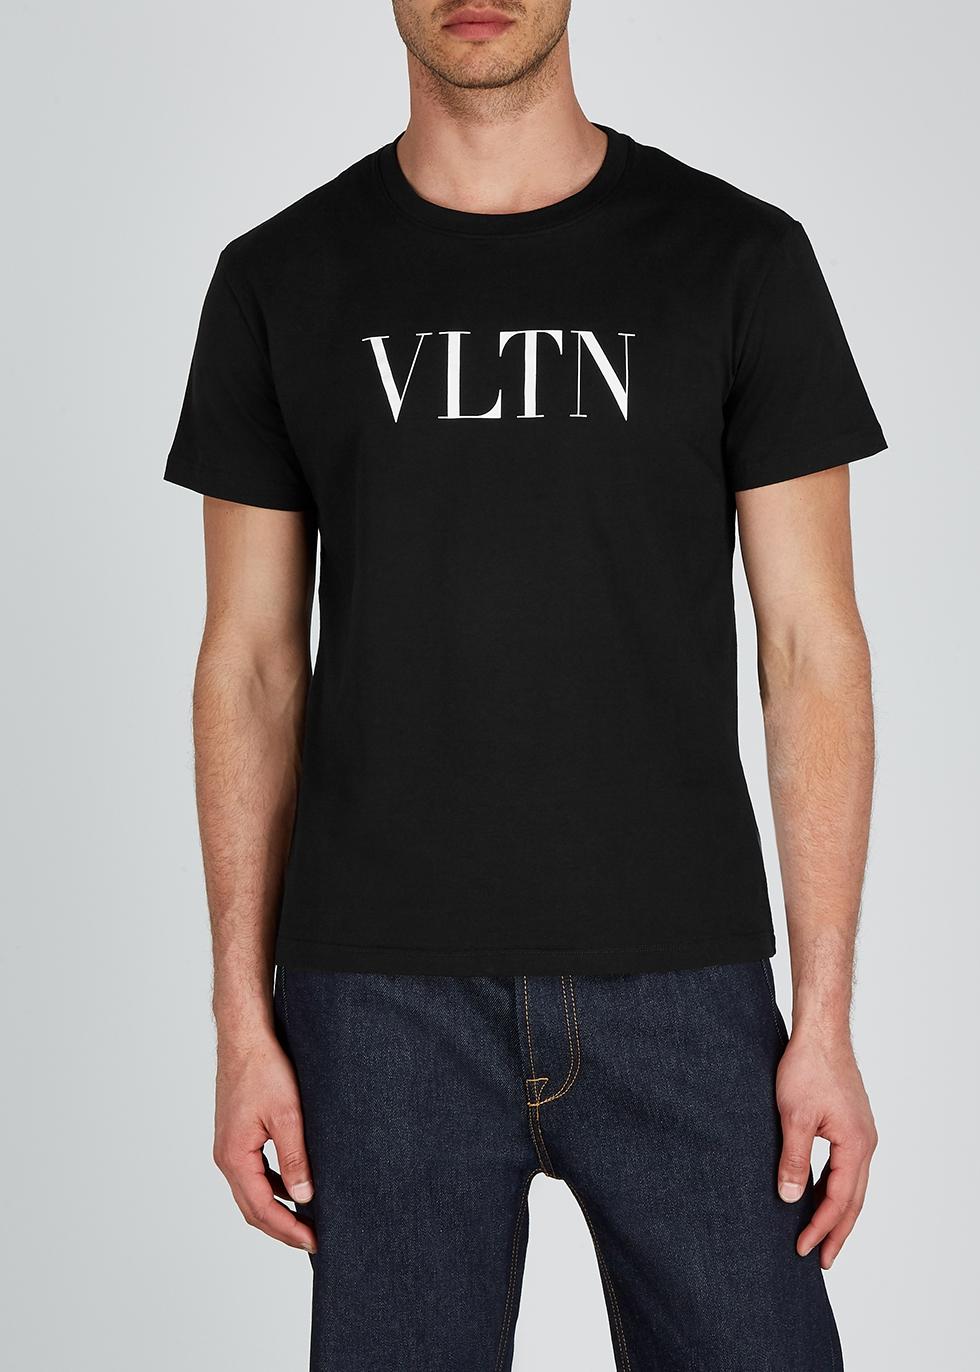 Black cotton T-shirt - Valentino